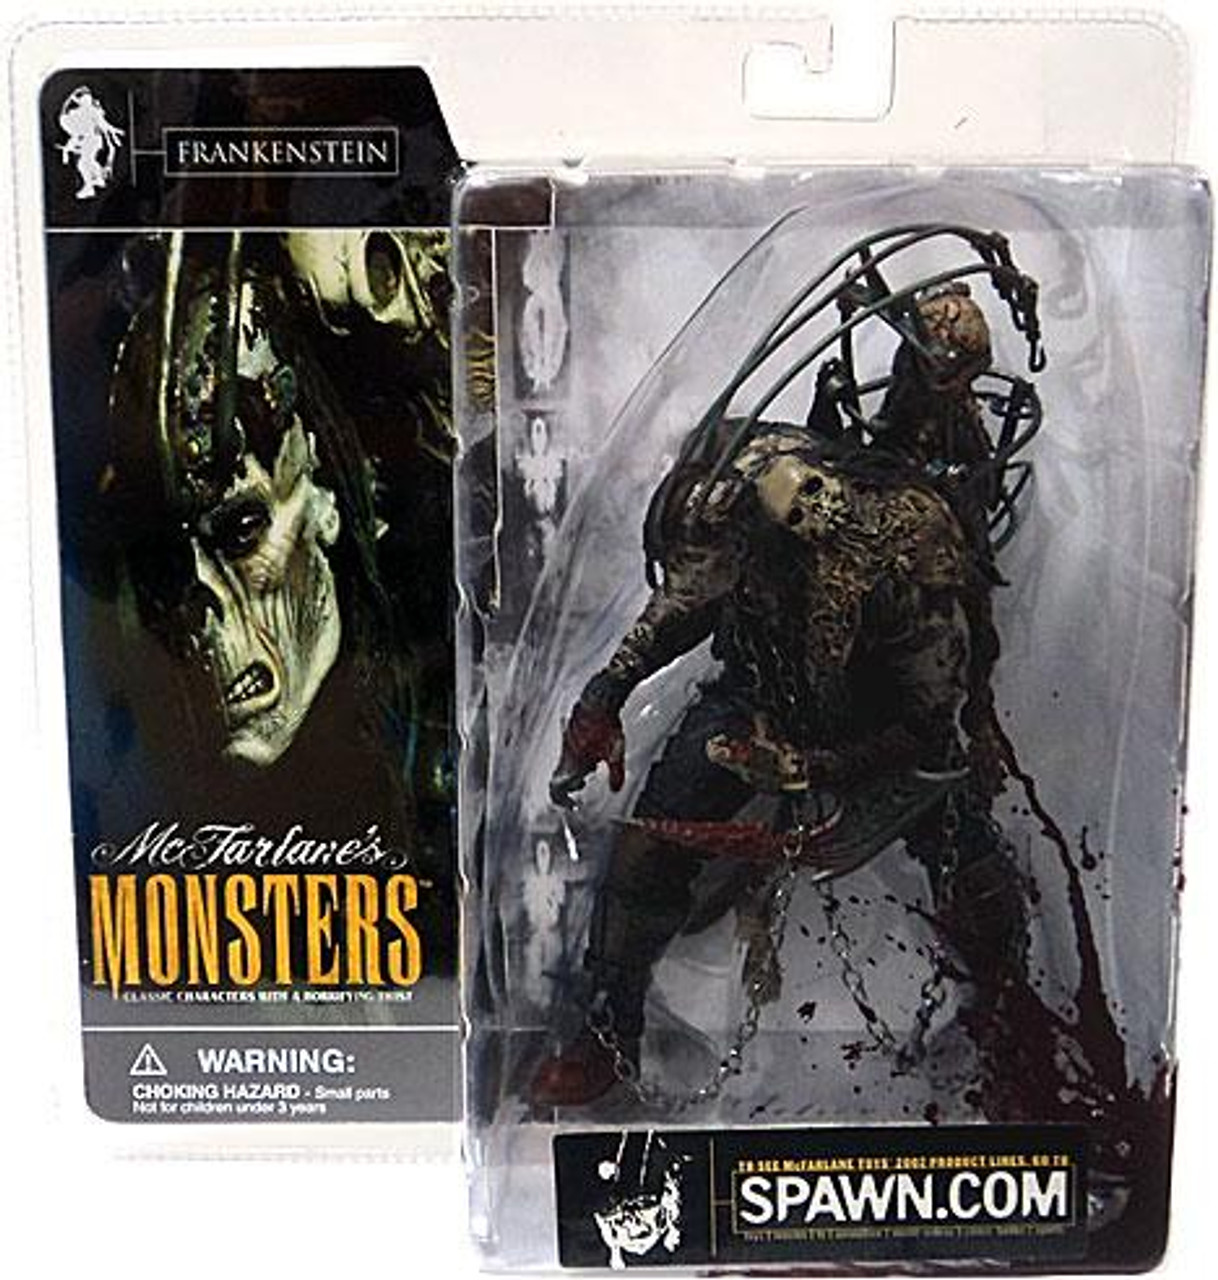 McFarlane Toys McFarlane's Monsters Series 1 Frankenstein Action Figure [Blood Splattered Package Variant]